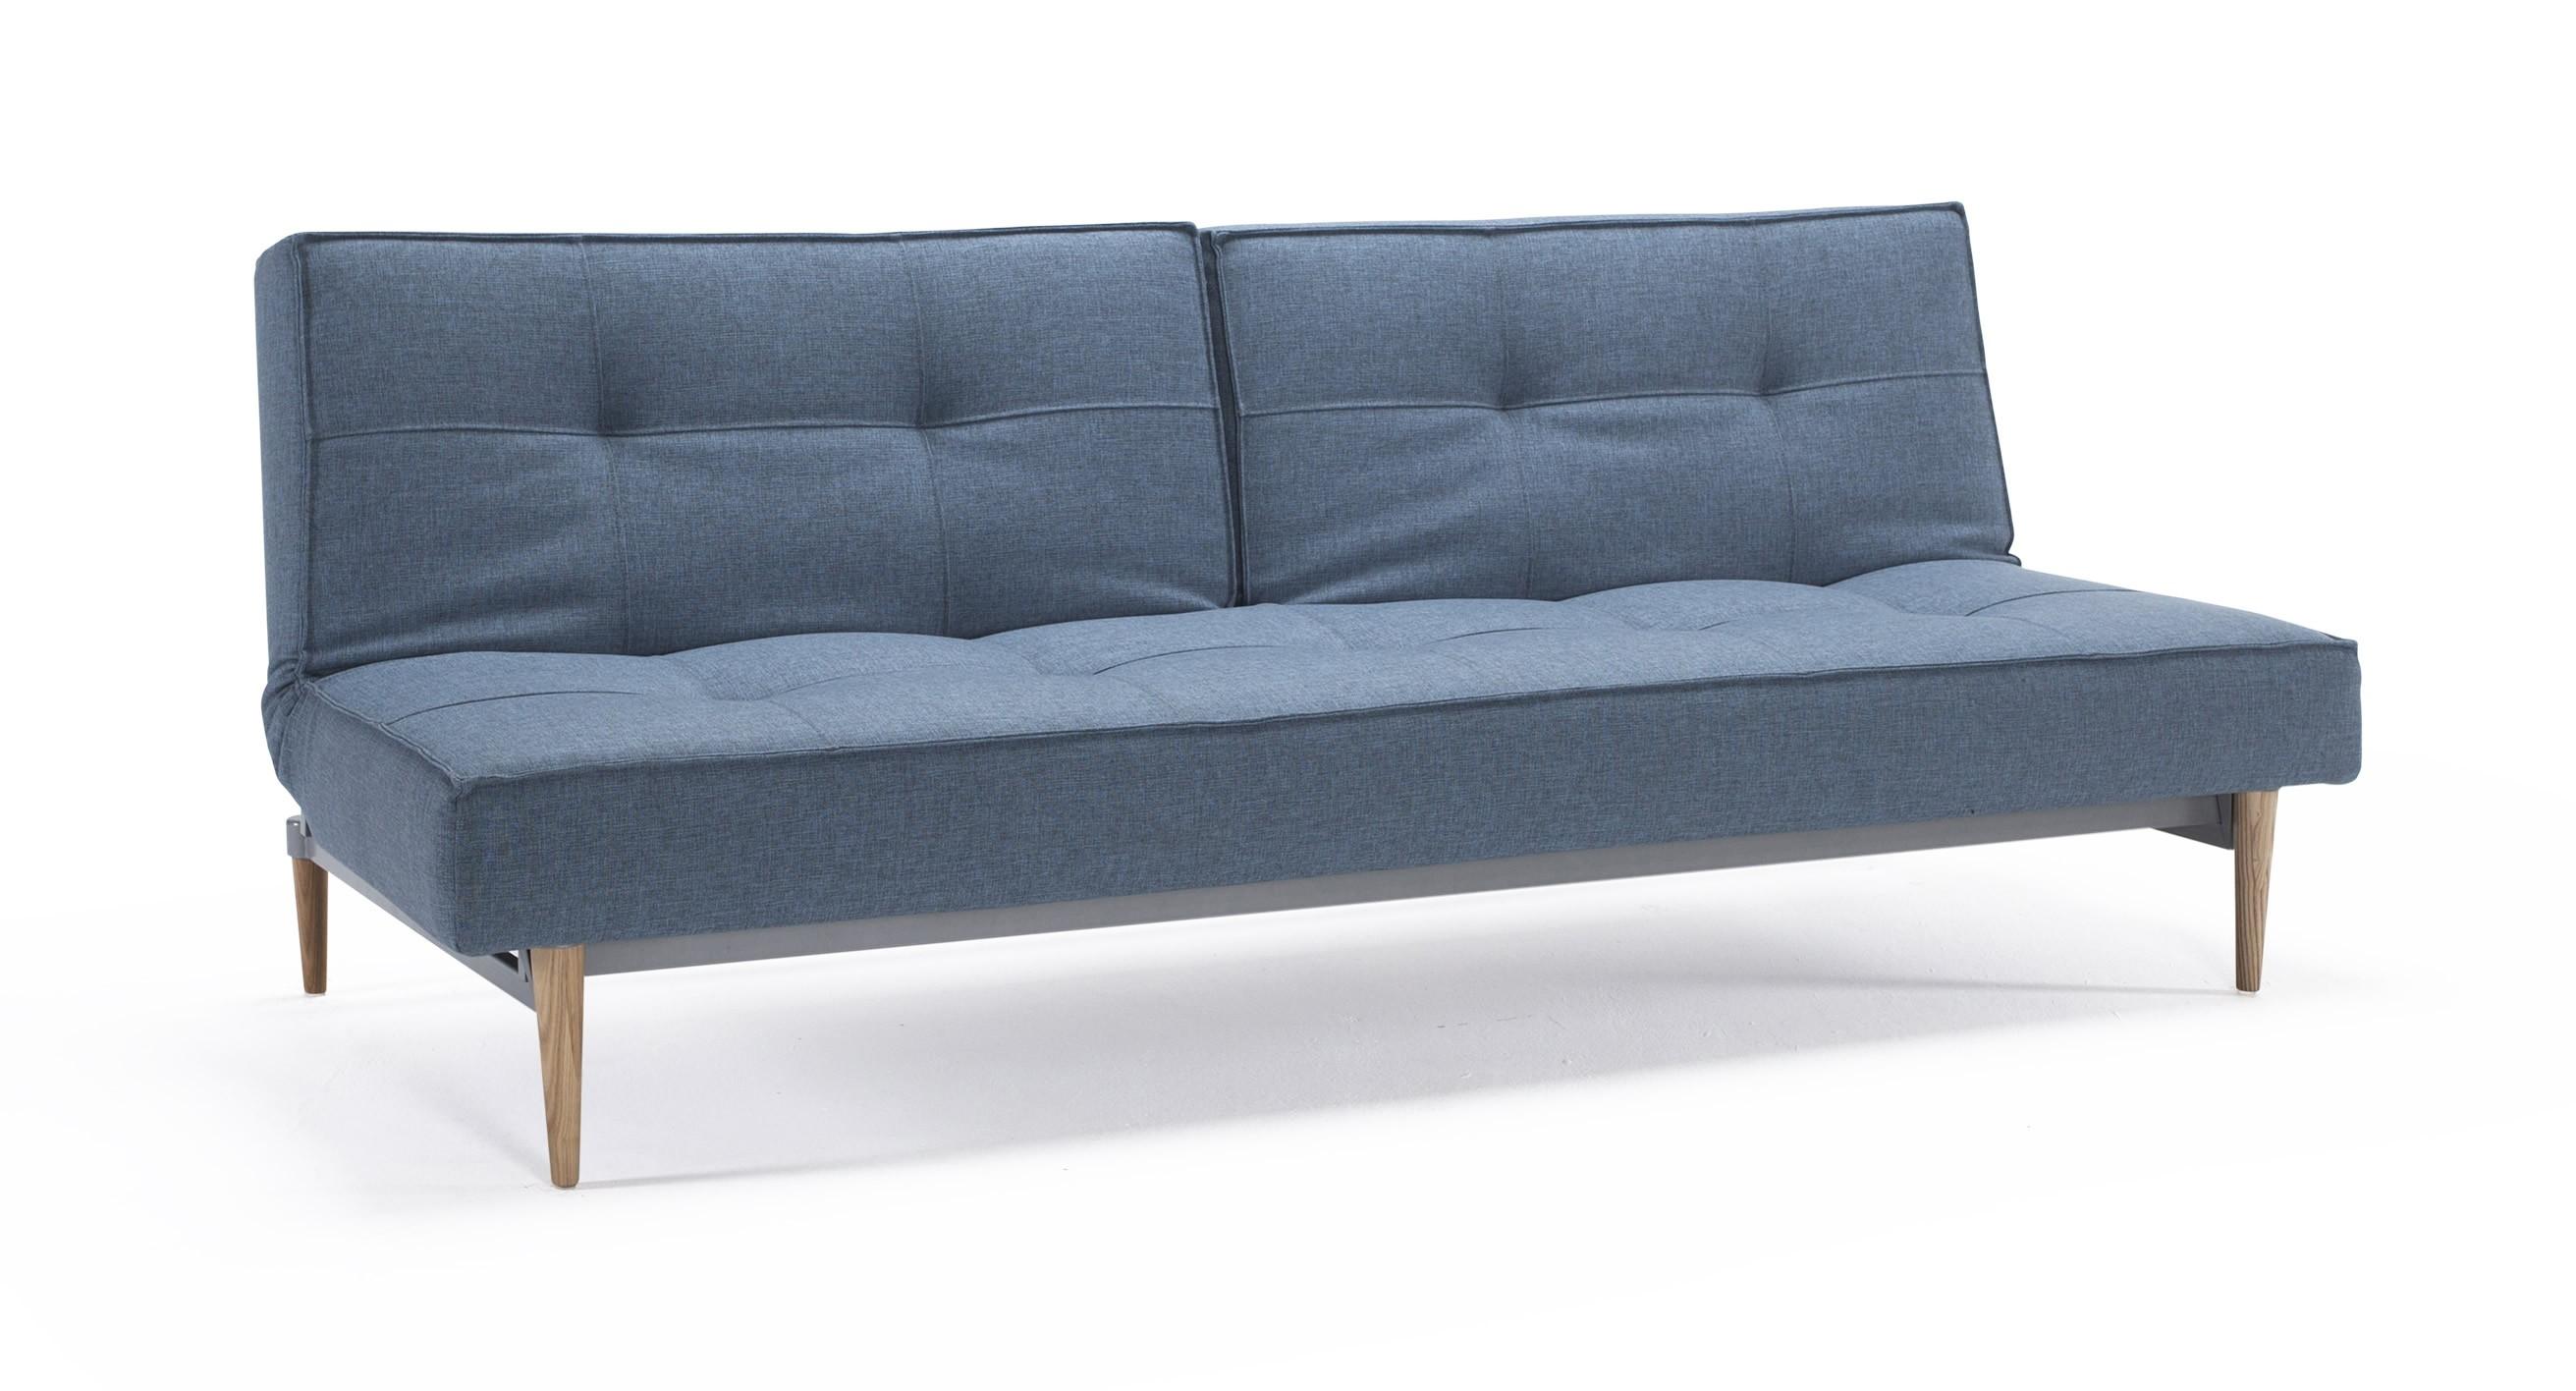 Splitback Sofa Bed 525 Mixed Dance